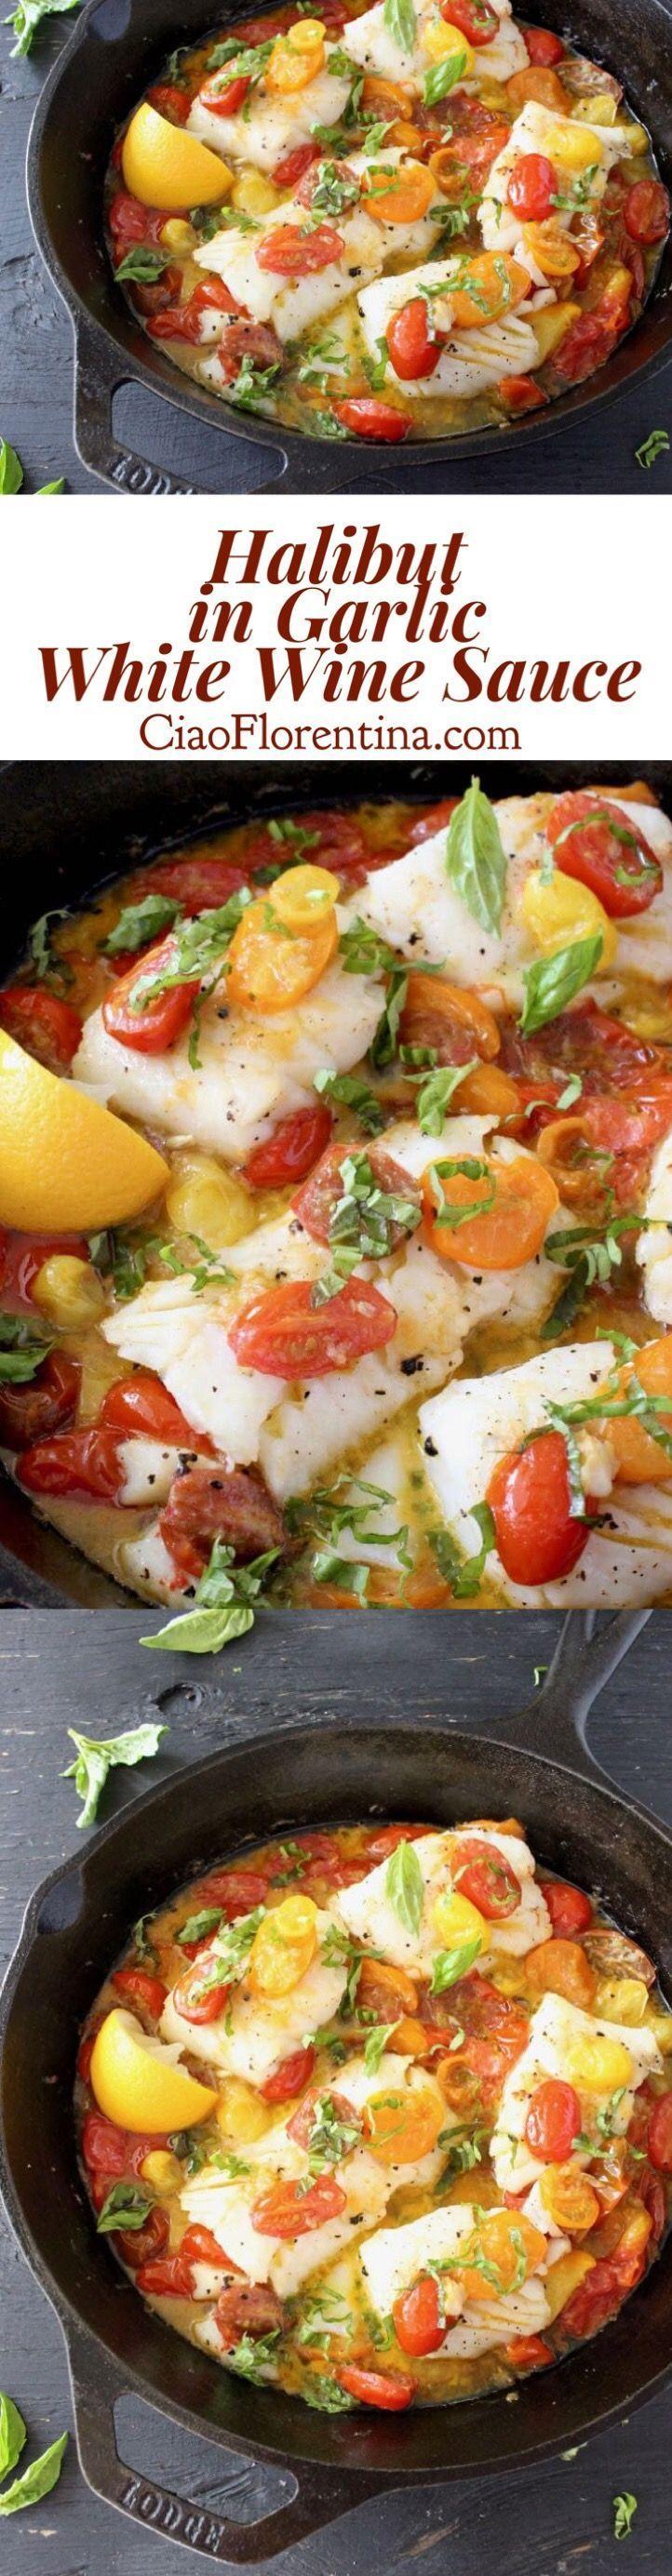 Pan Seared Halibut in Lemon Garlic White Wine Sauce Recipe | CiaoFlorentina.com @CiaoFlorentina